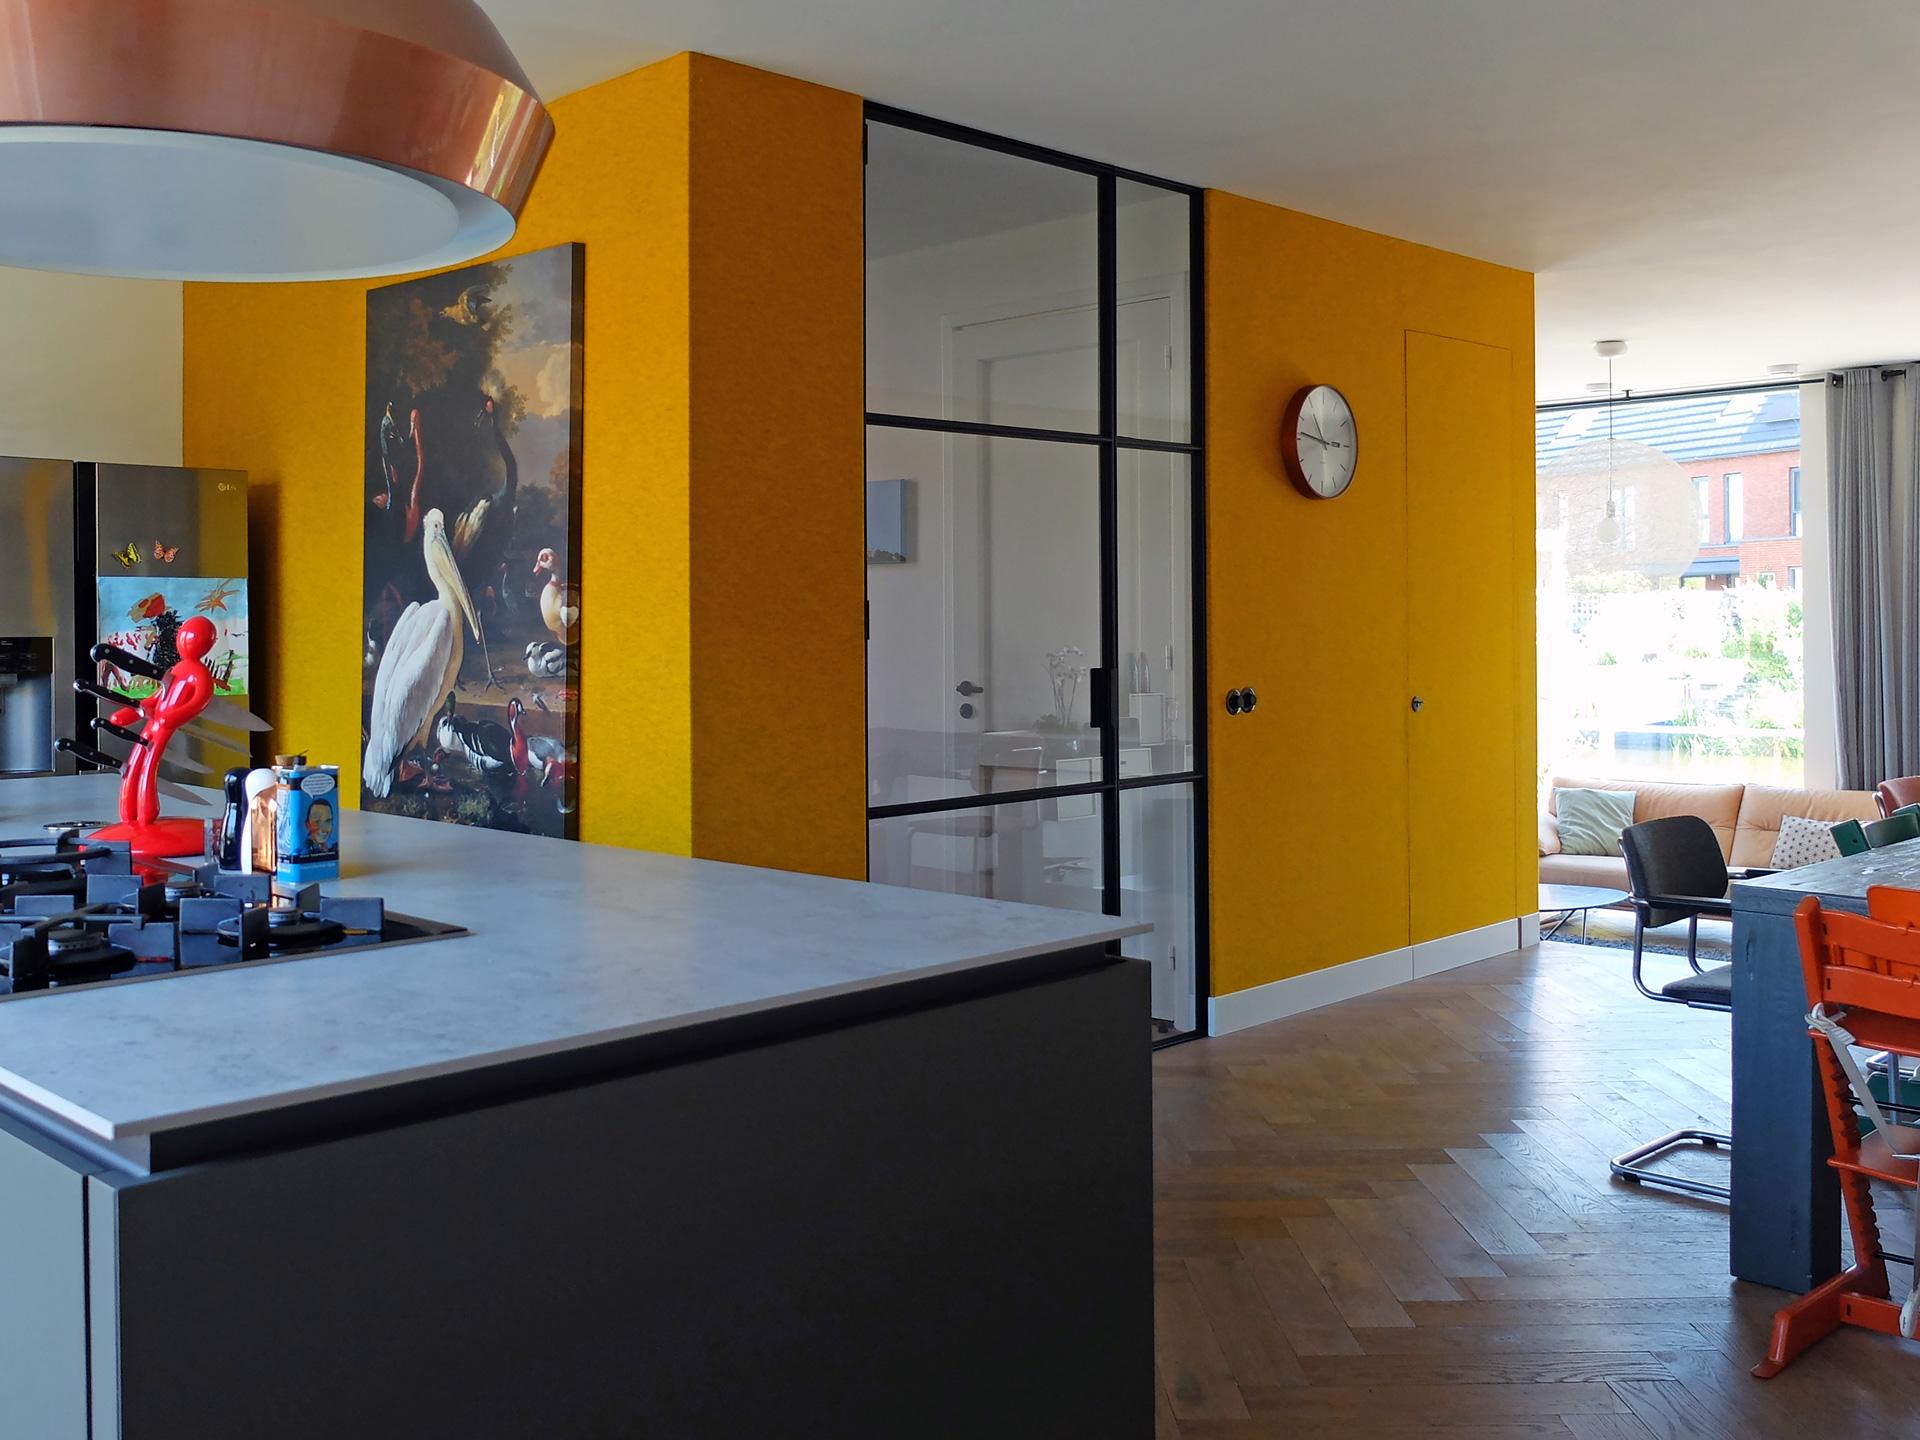 LAGADO-architects-orange-core-kitchen-island-dining-felt-residential-interior-at-home